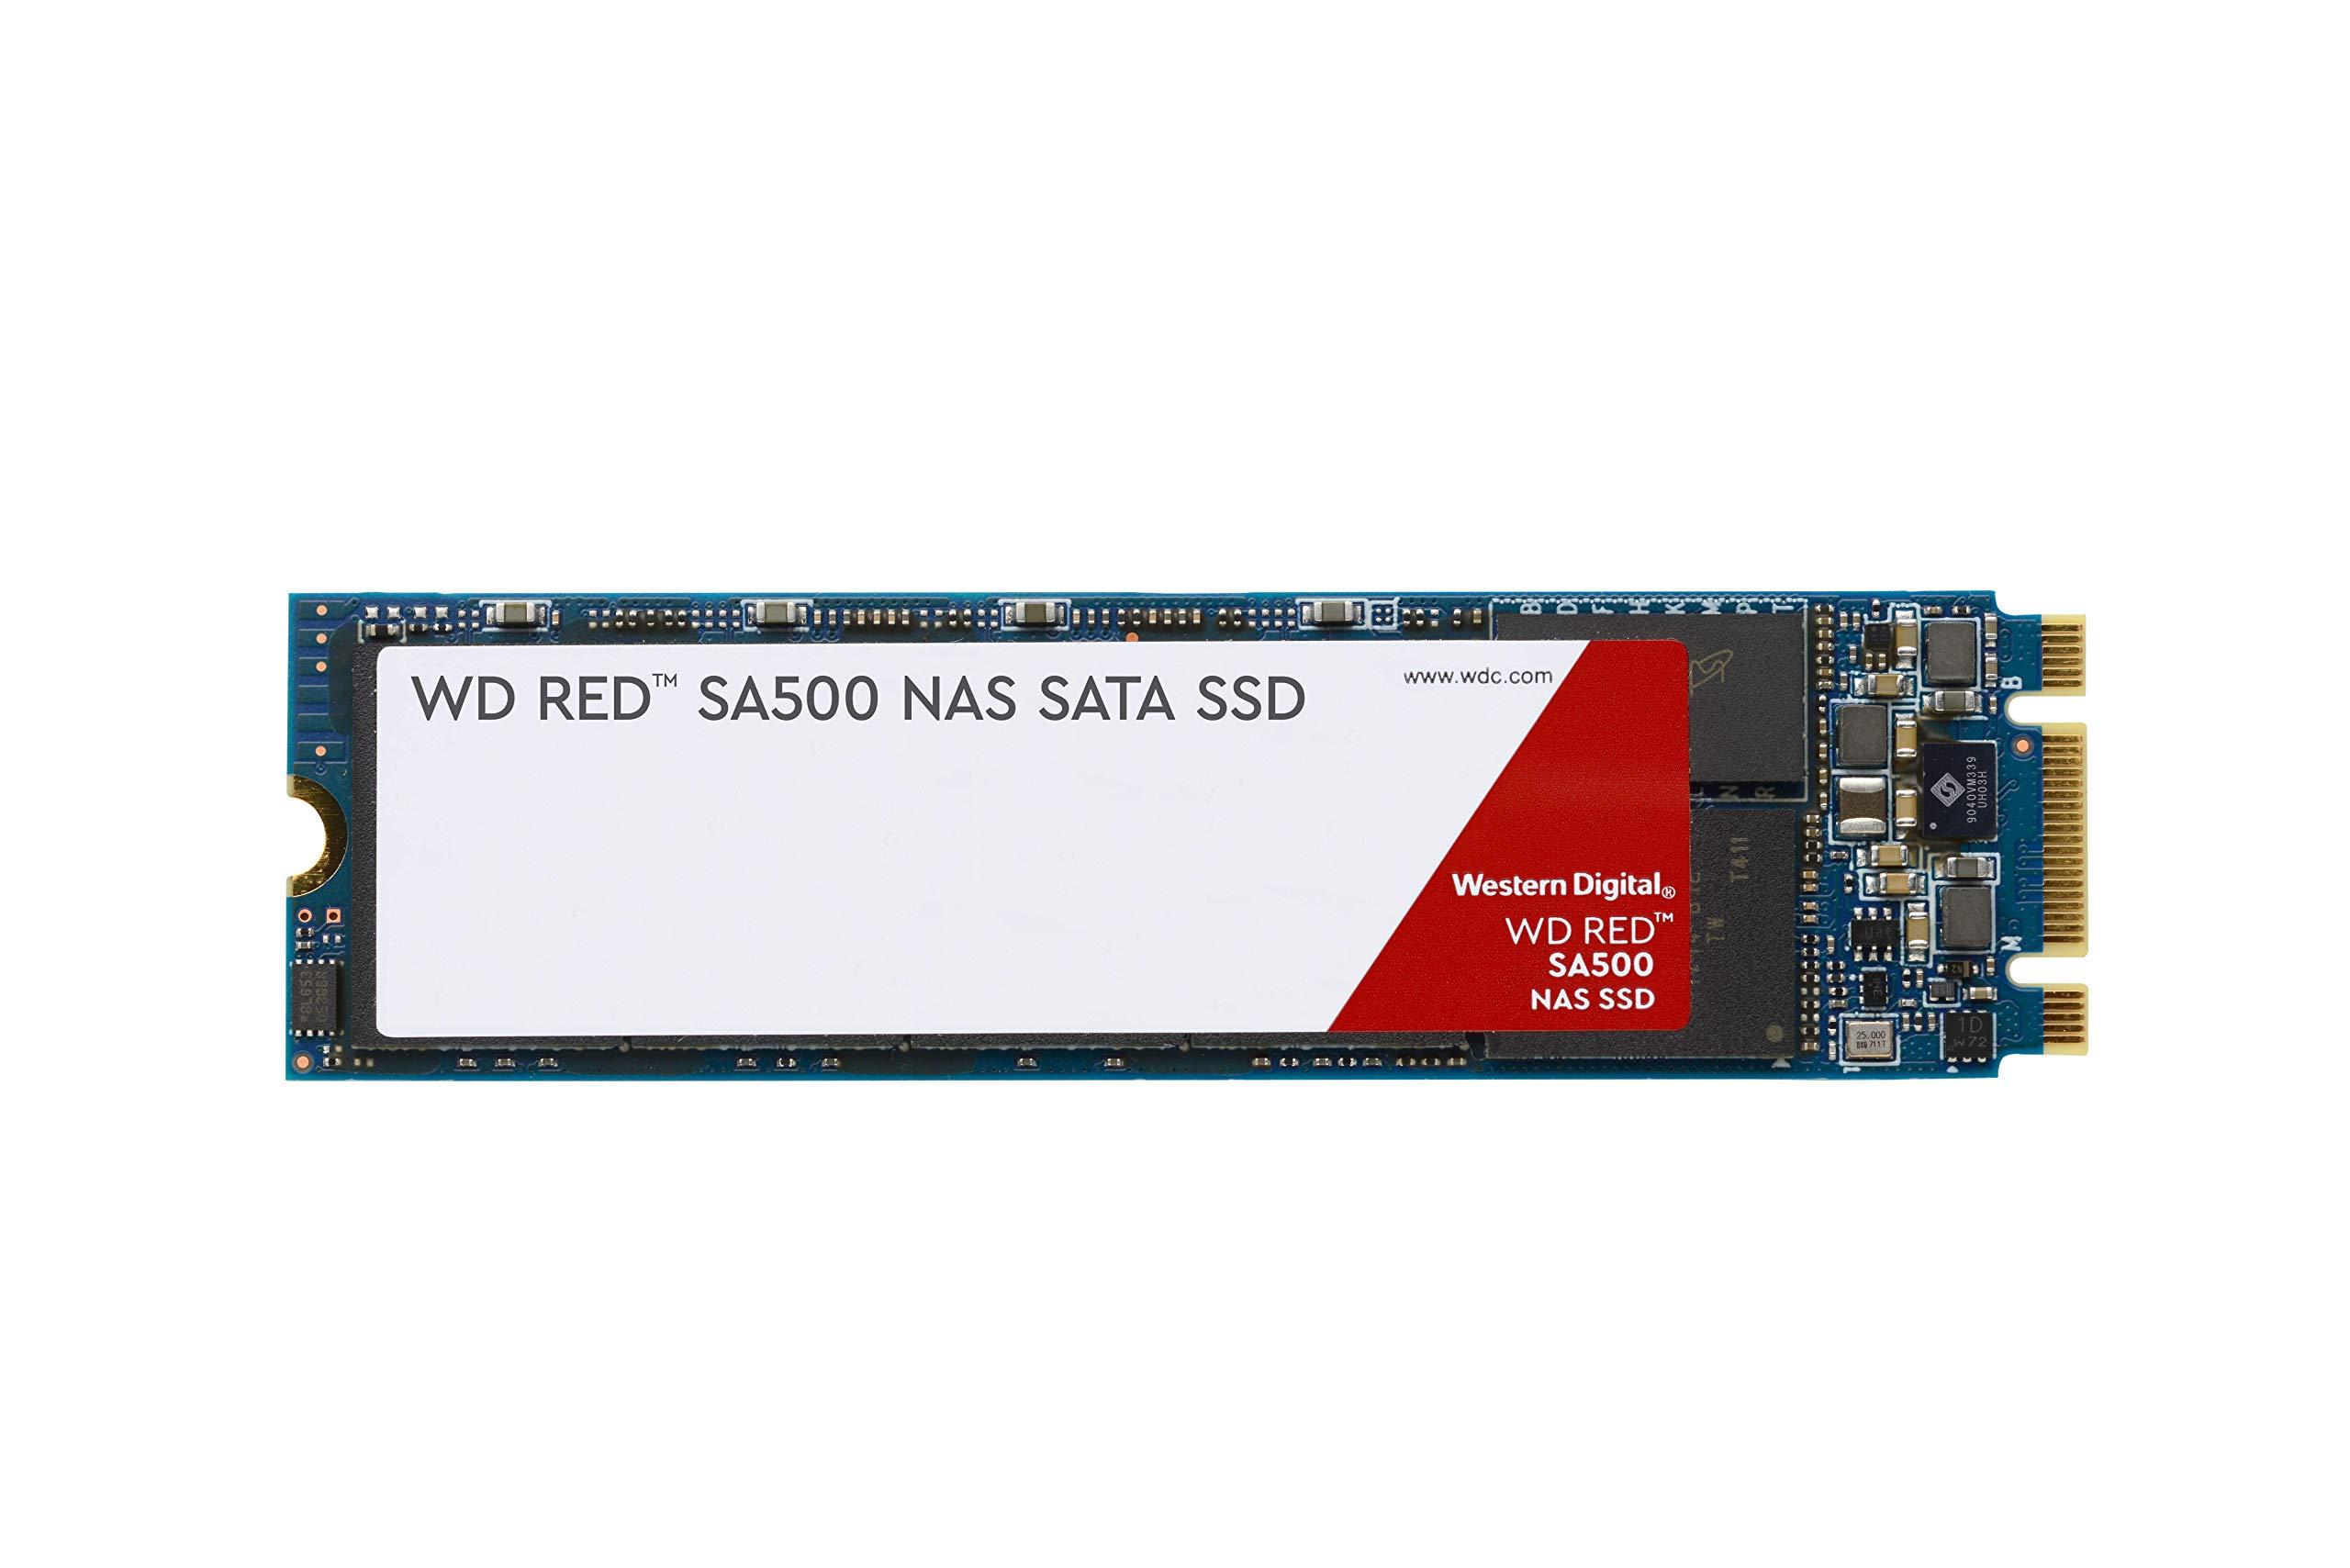 M.2 2280 500gb Sata Wd Red Sa500 Nas 500gb 3d Nand 6 Gb/s M.